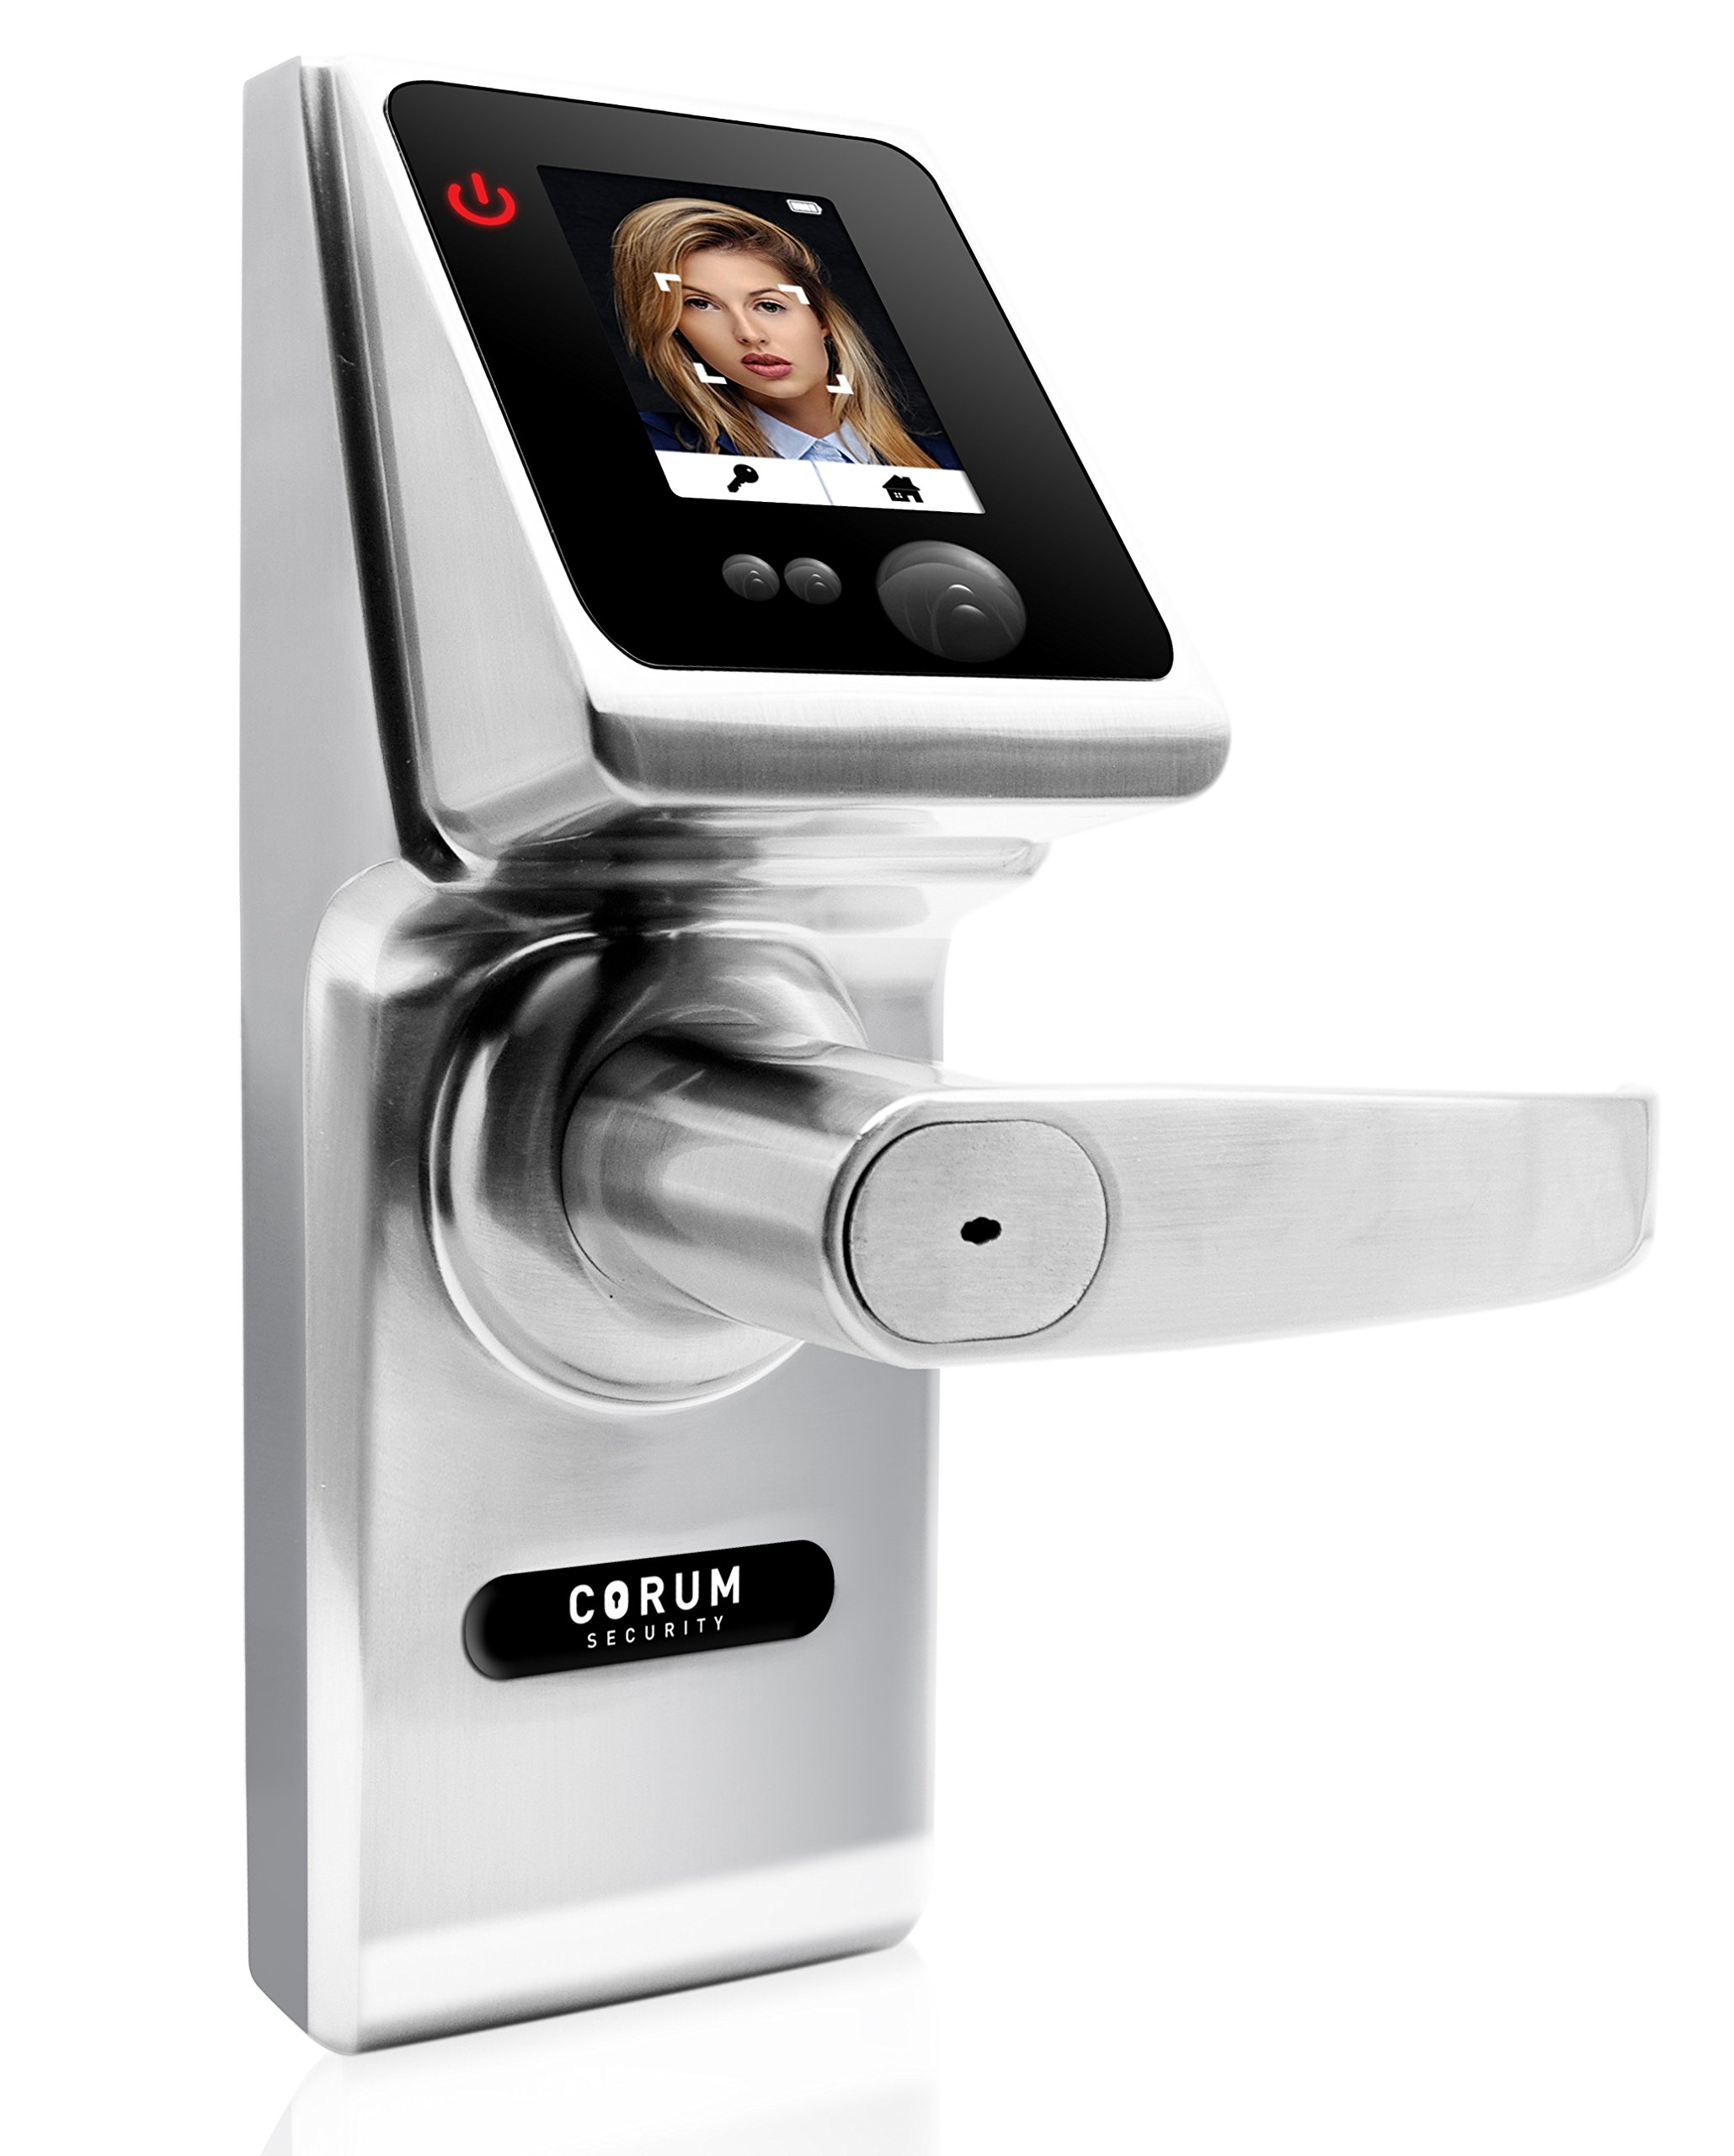 Corum Security Biometric Keyless Facial Recognition Door Lock Knob